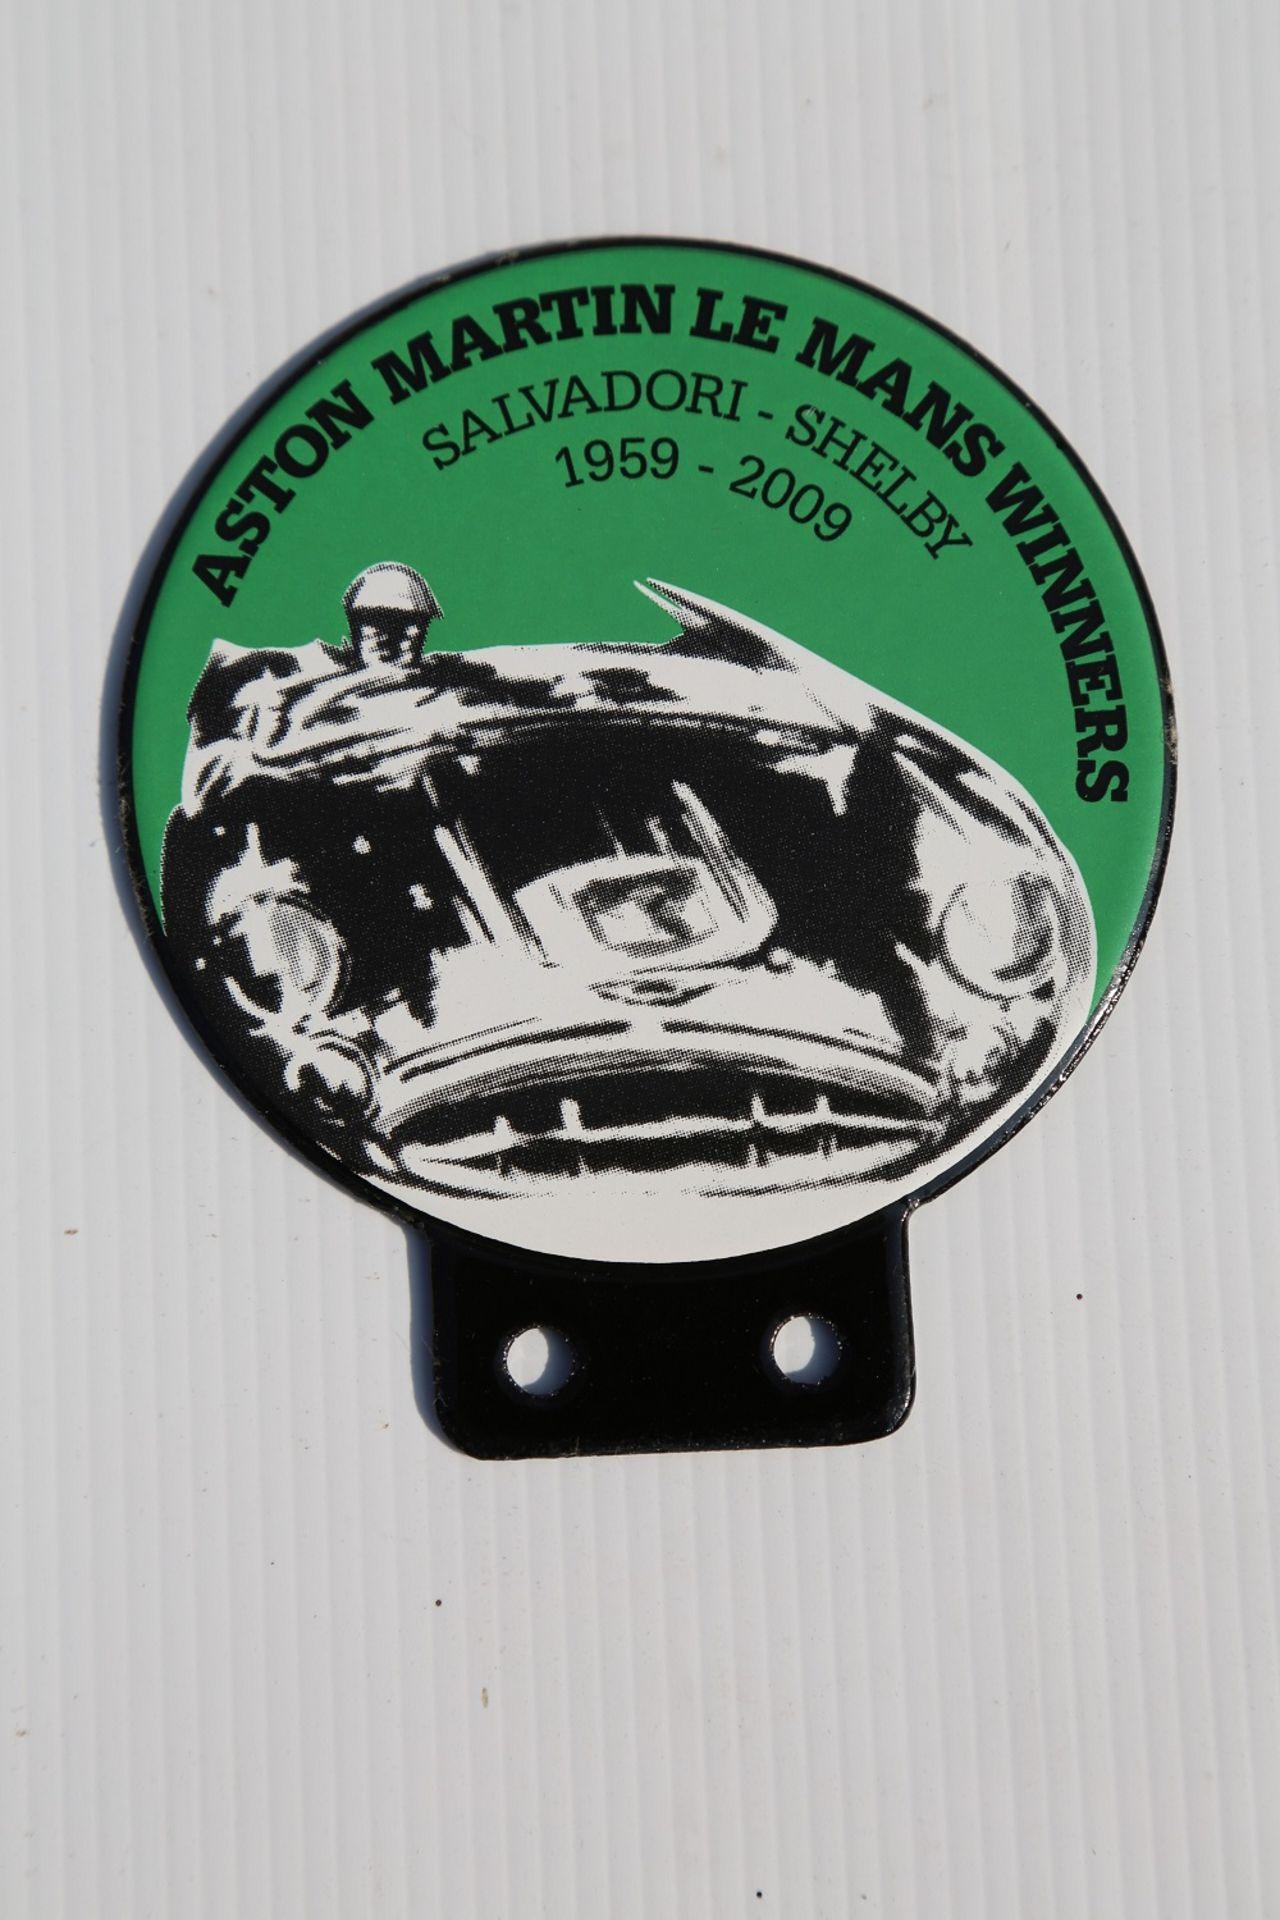 Lot 10 - Enamal Car Badge Commemorating the Le Mans Victory 1959-2009